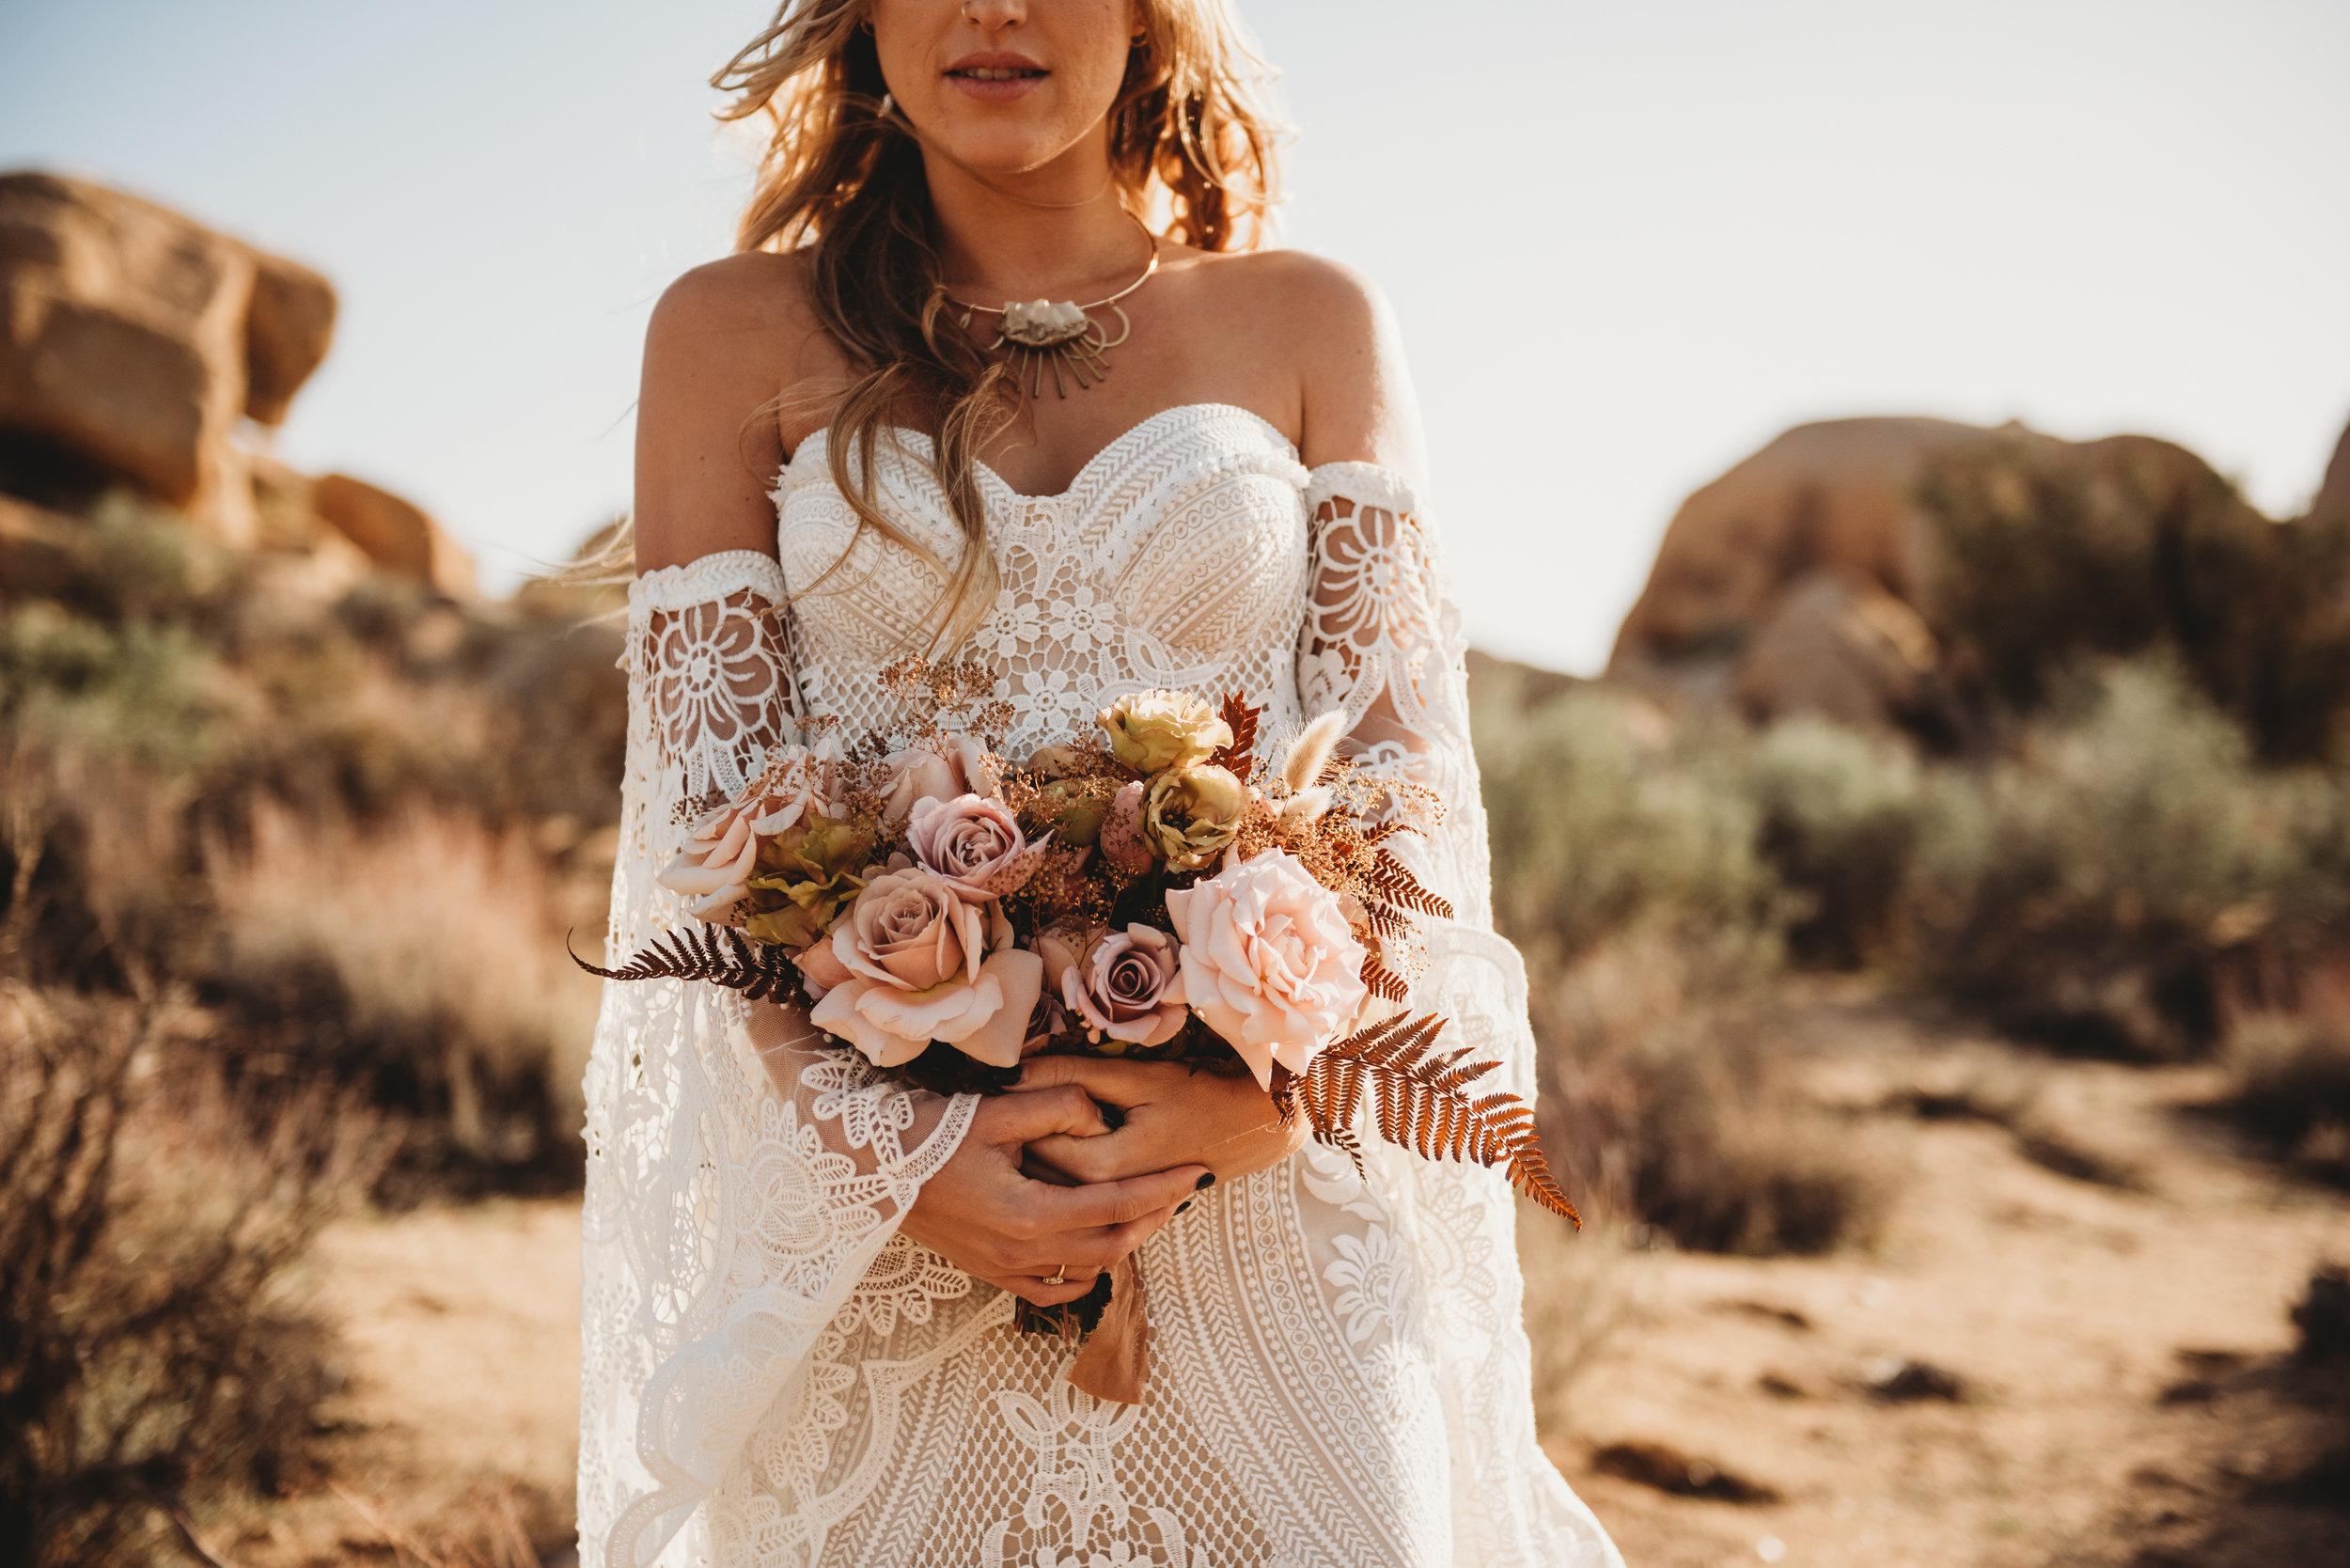 FortSt.John_photographer_TyraEPhotography_Wedding_Couple_Family_Photograhy_DawsonCreek_Elopement_Bride_Boduoir_Portraits-4914.jpg